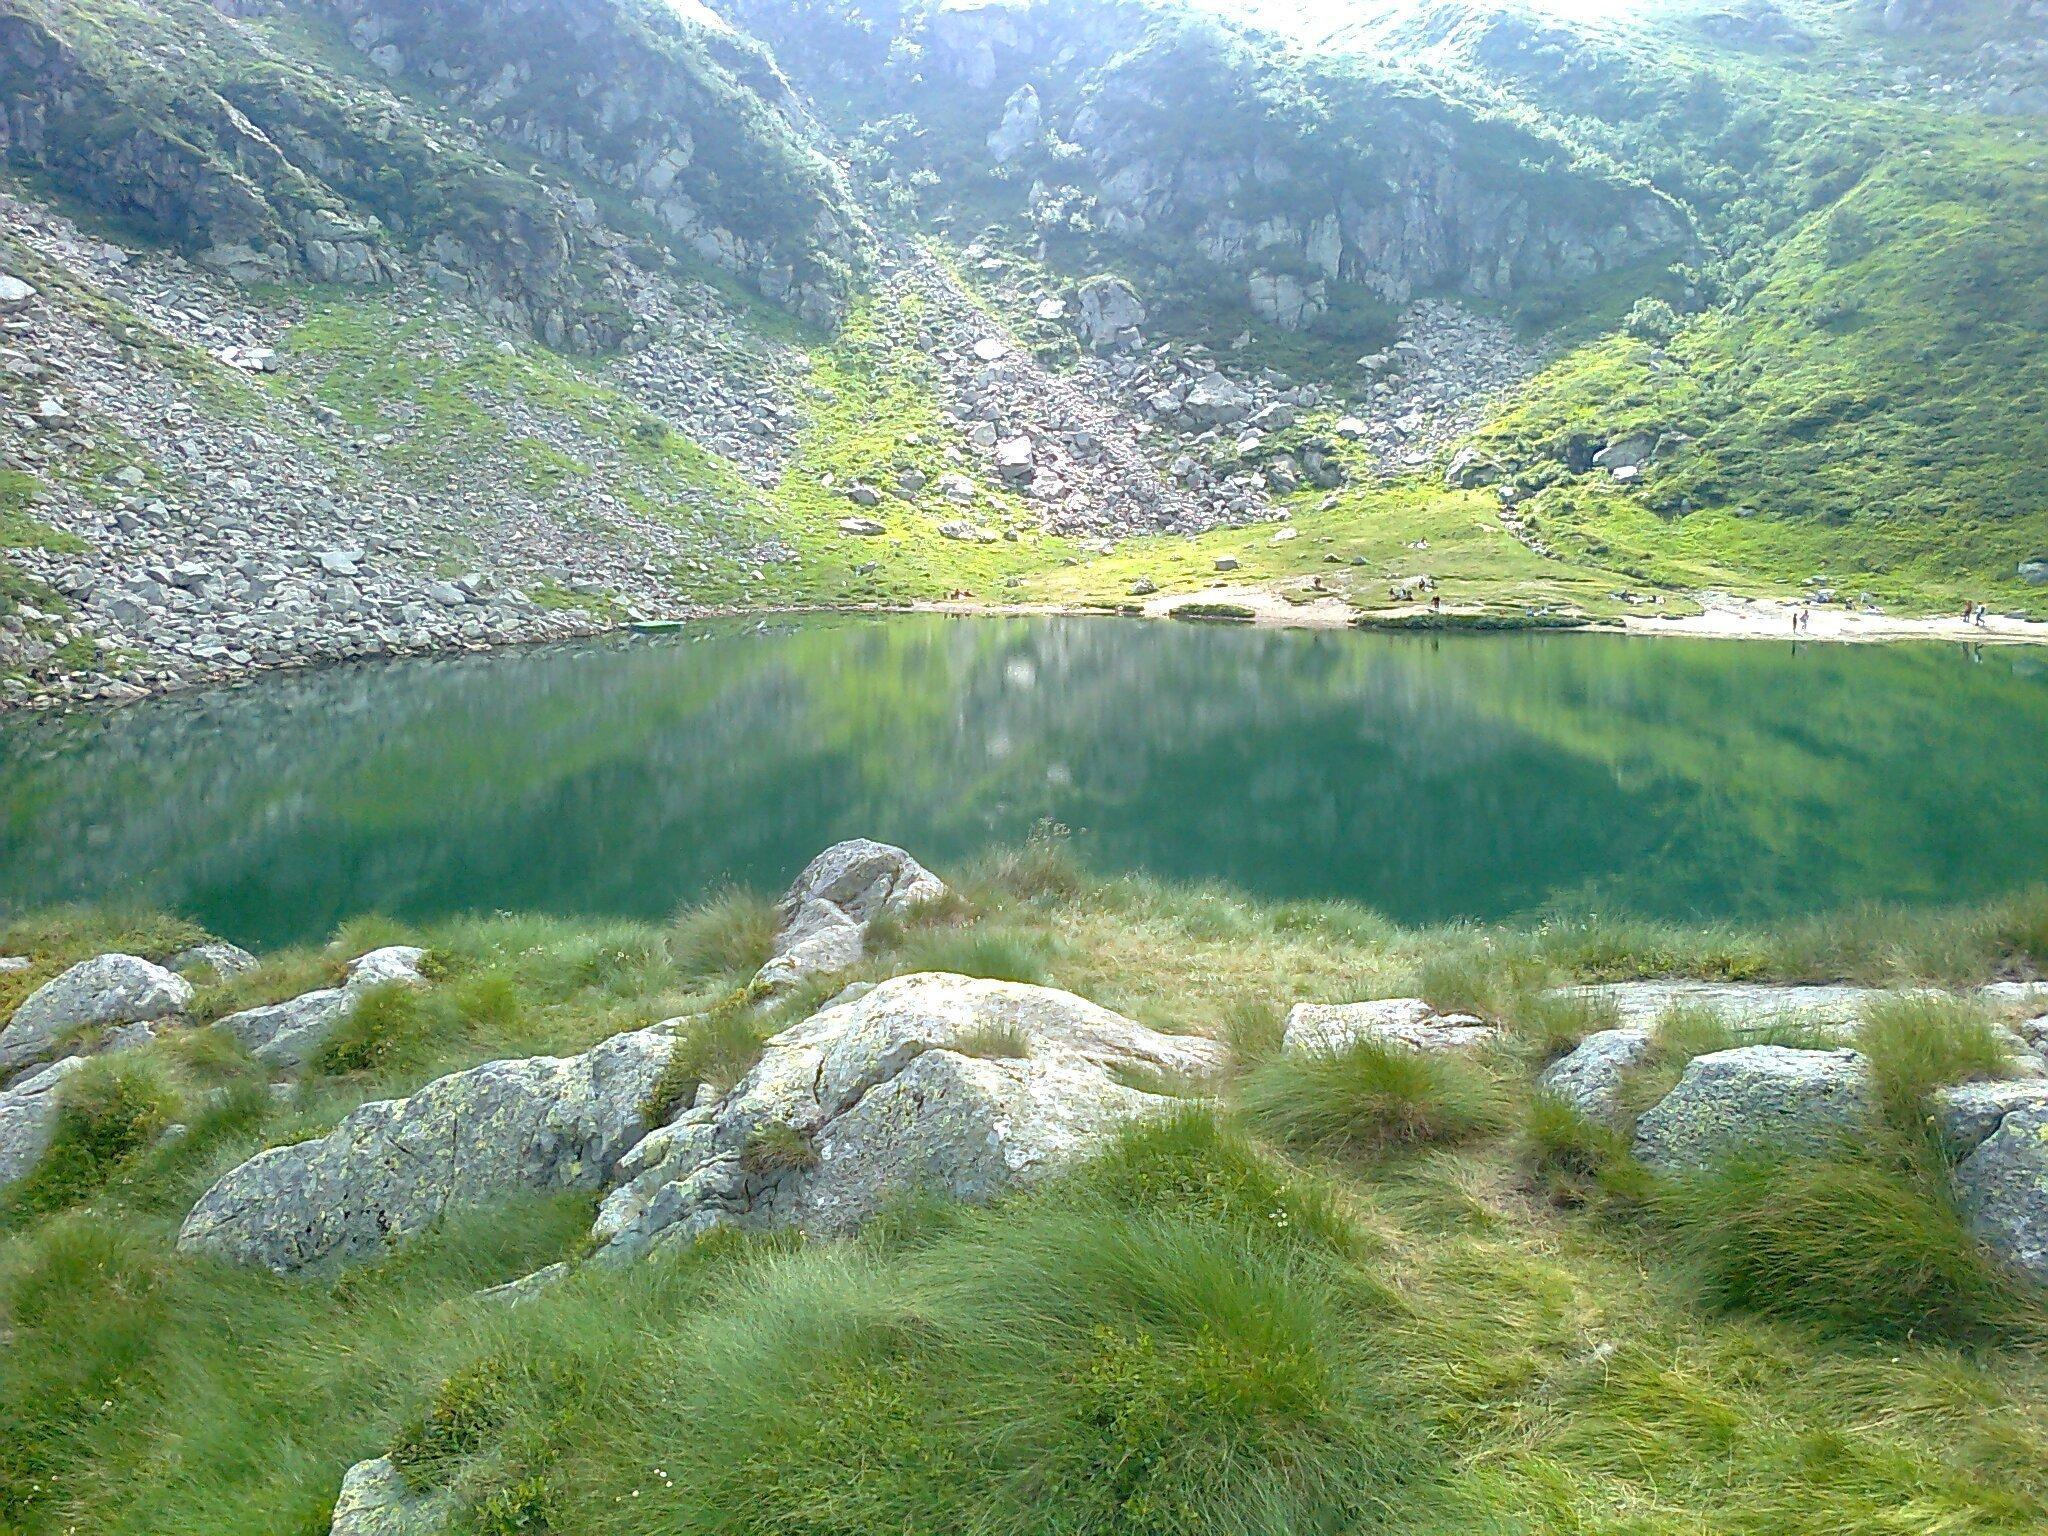 a lake in the mountains 10 1440x1080 - A lake in the mountains